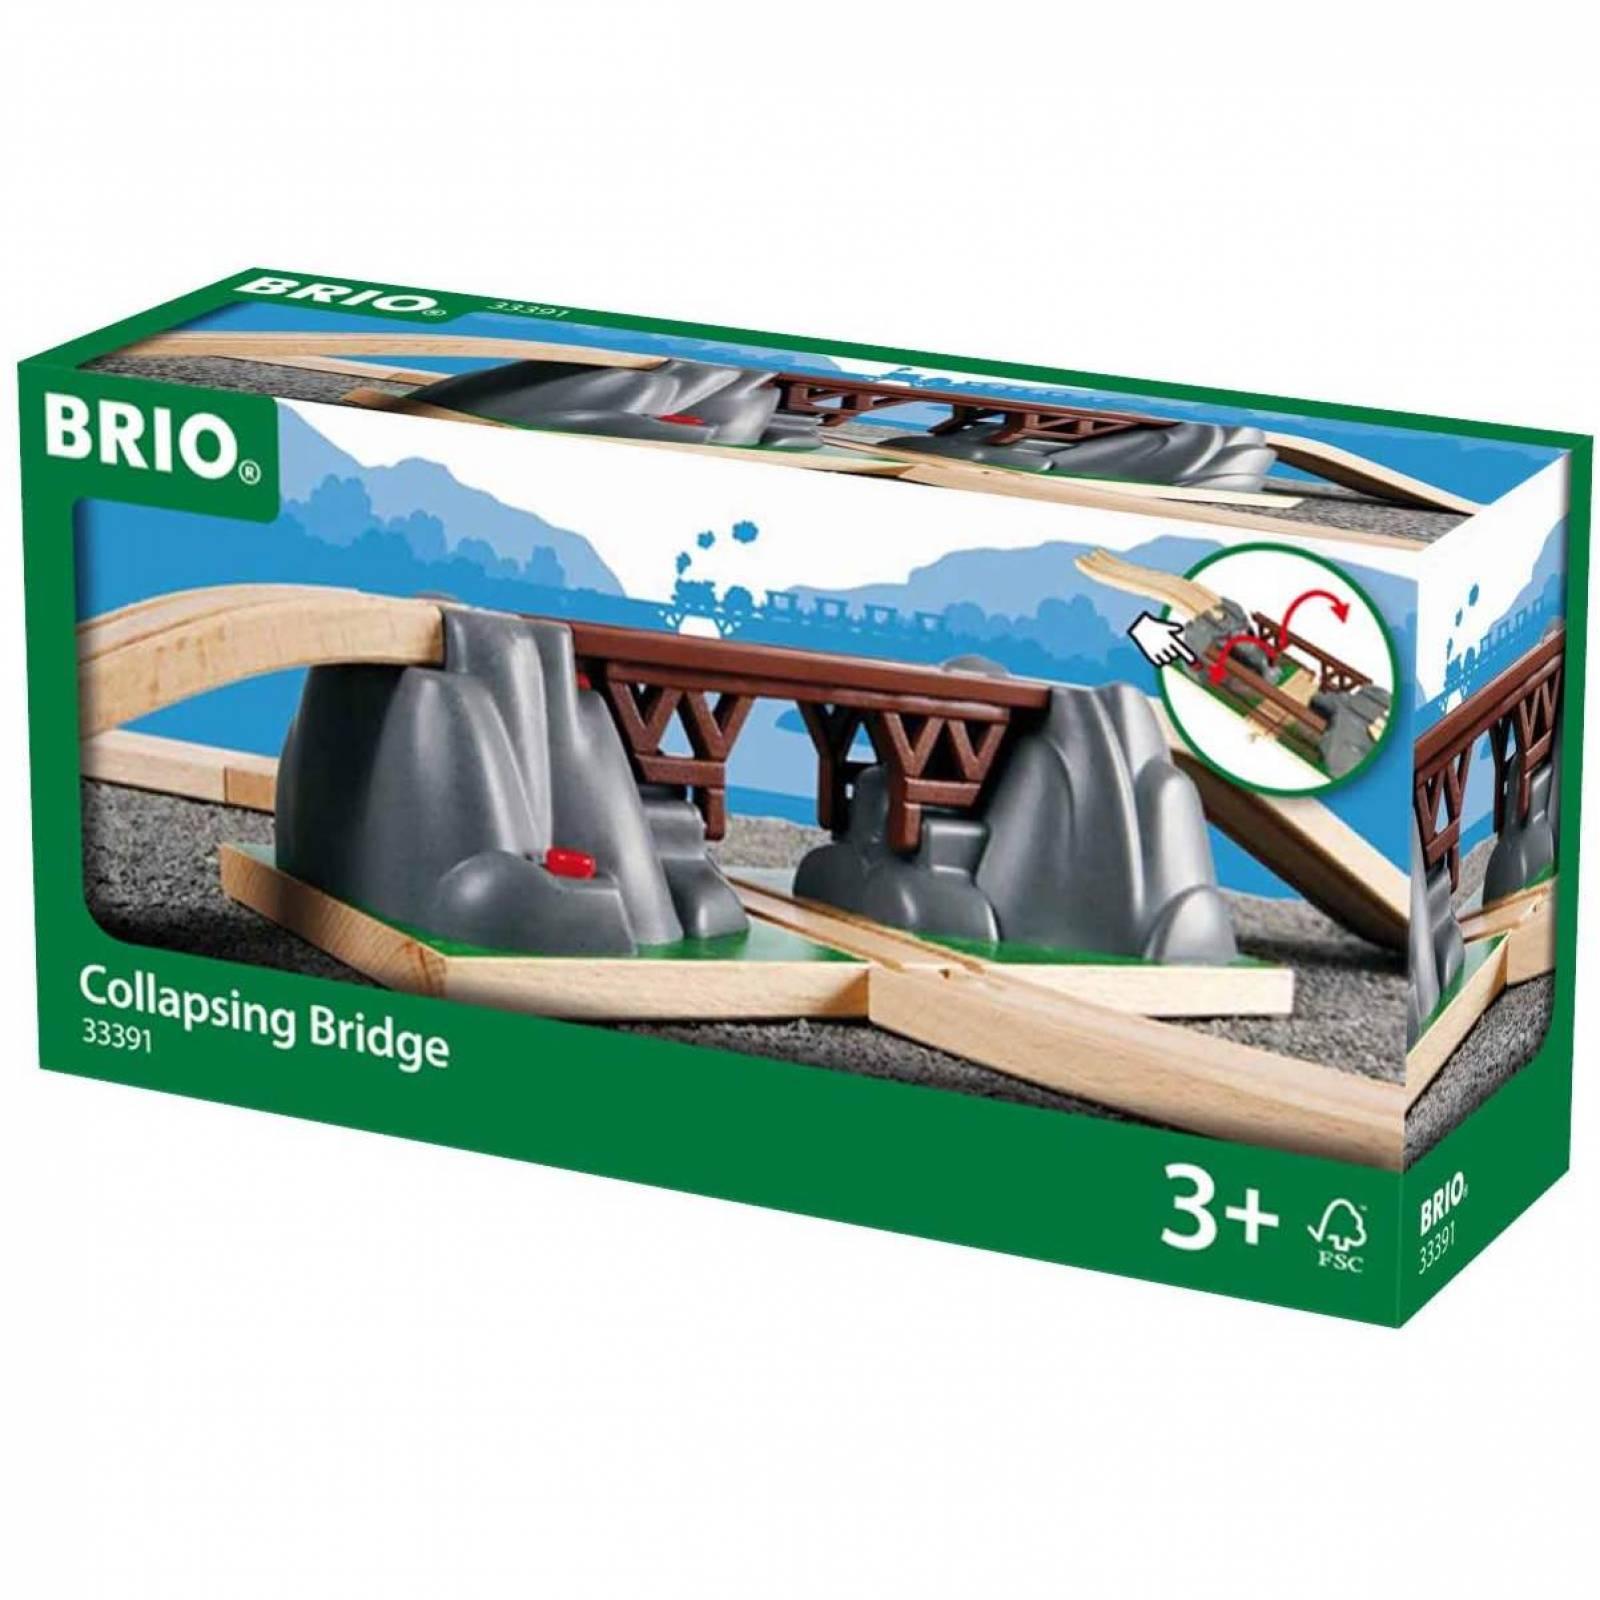 Collapsing Bridge for Railway BRIO Wooden Railway 3+